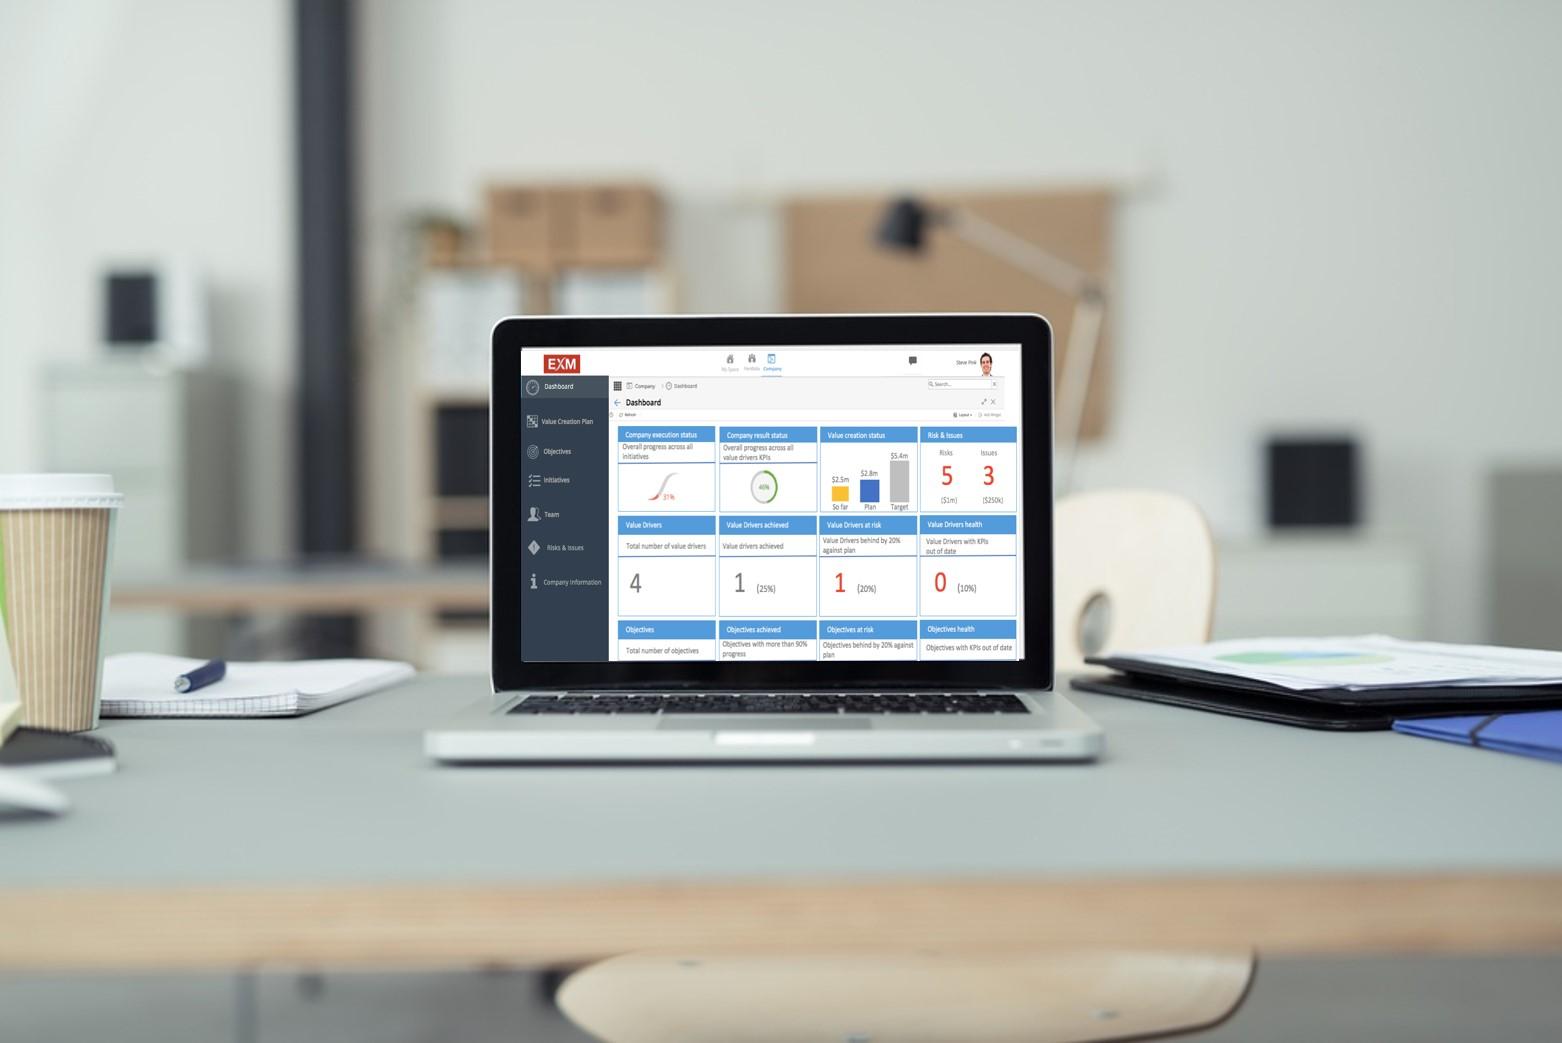 EXM cloud on a laptop